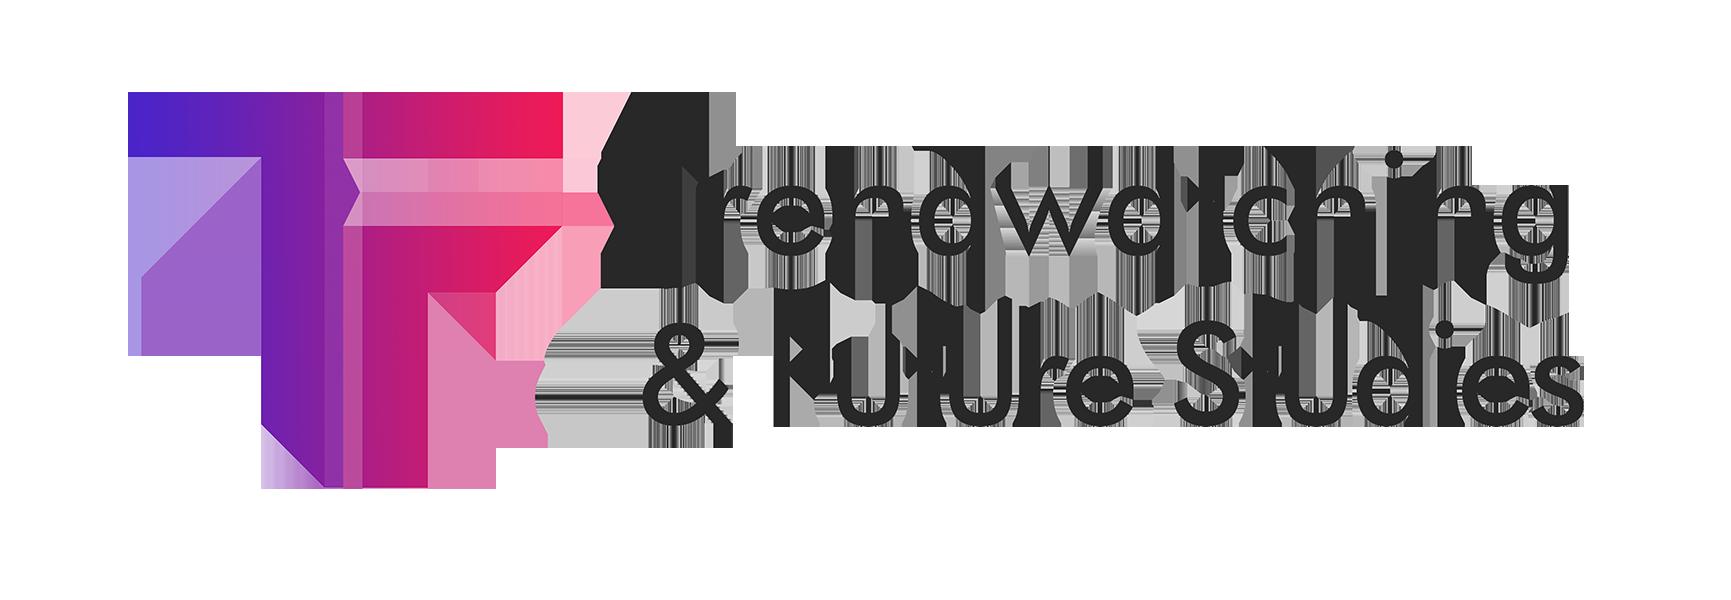 Trendwatching & Future Studies